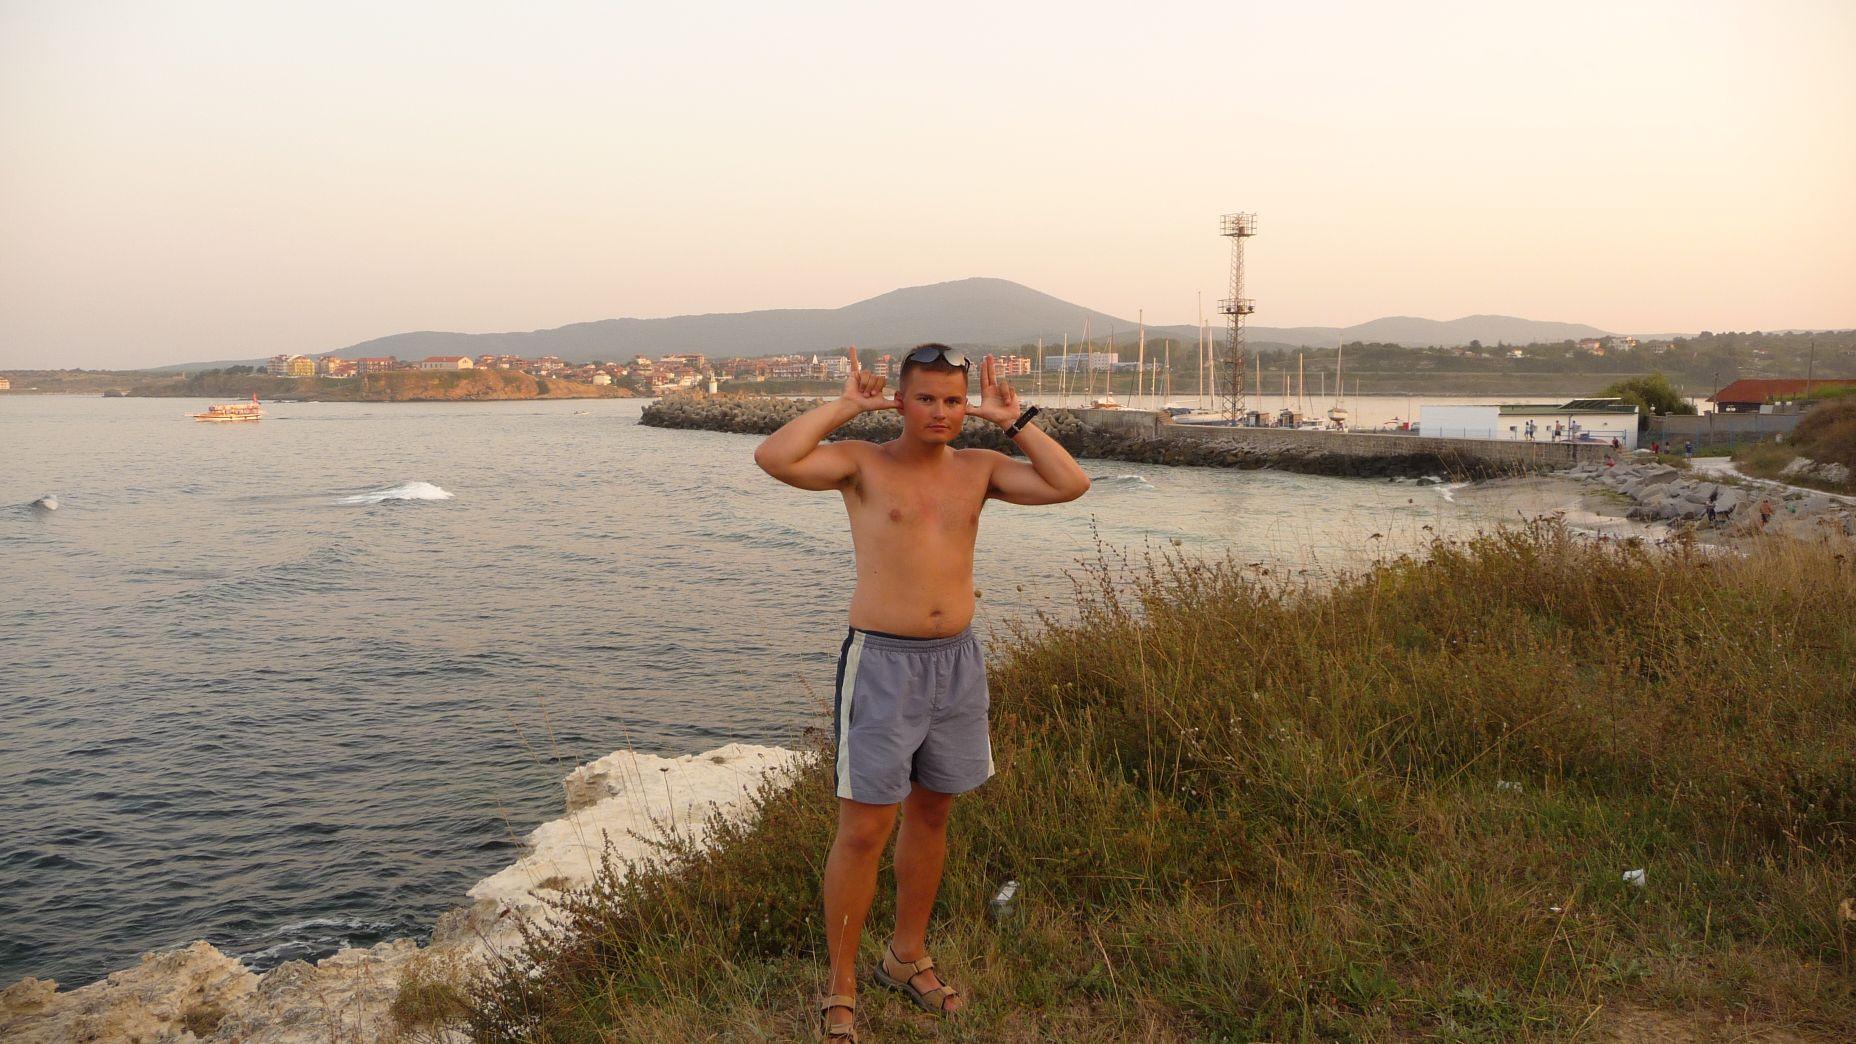 Bułgaria - Tsarevo - zdjęcia, atrakcje